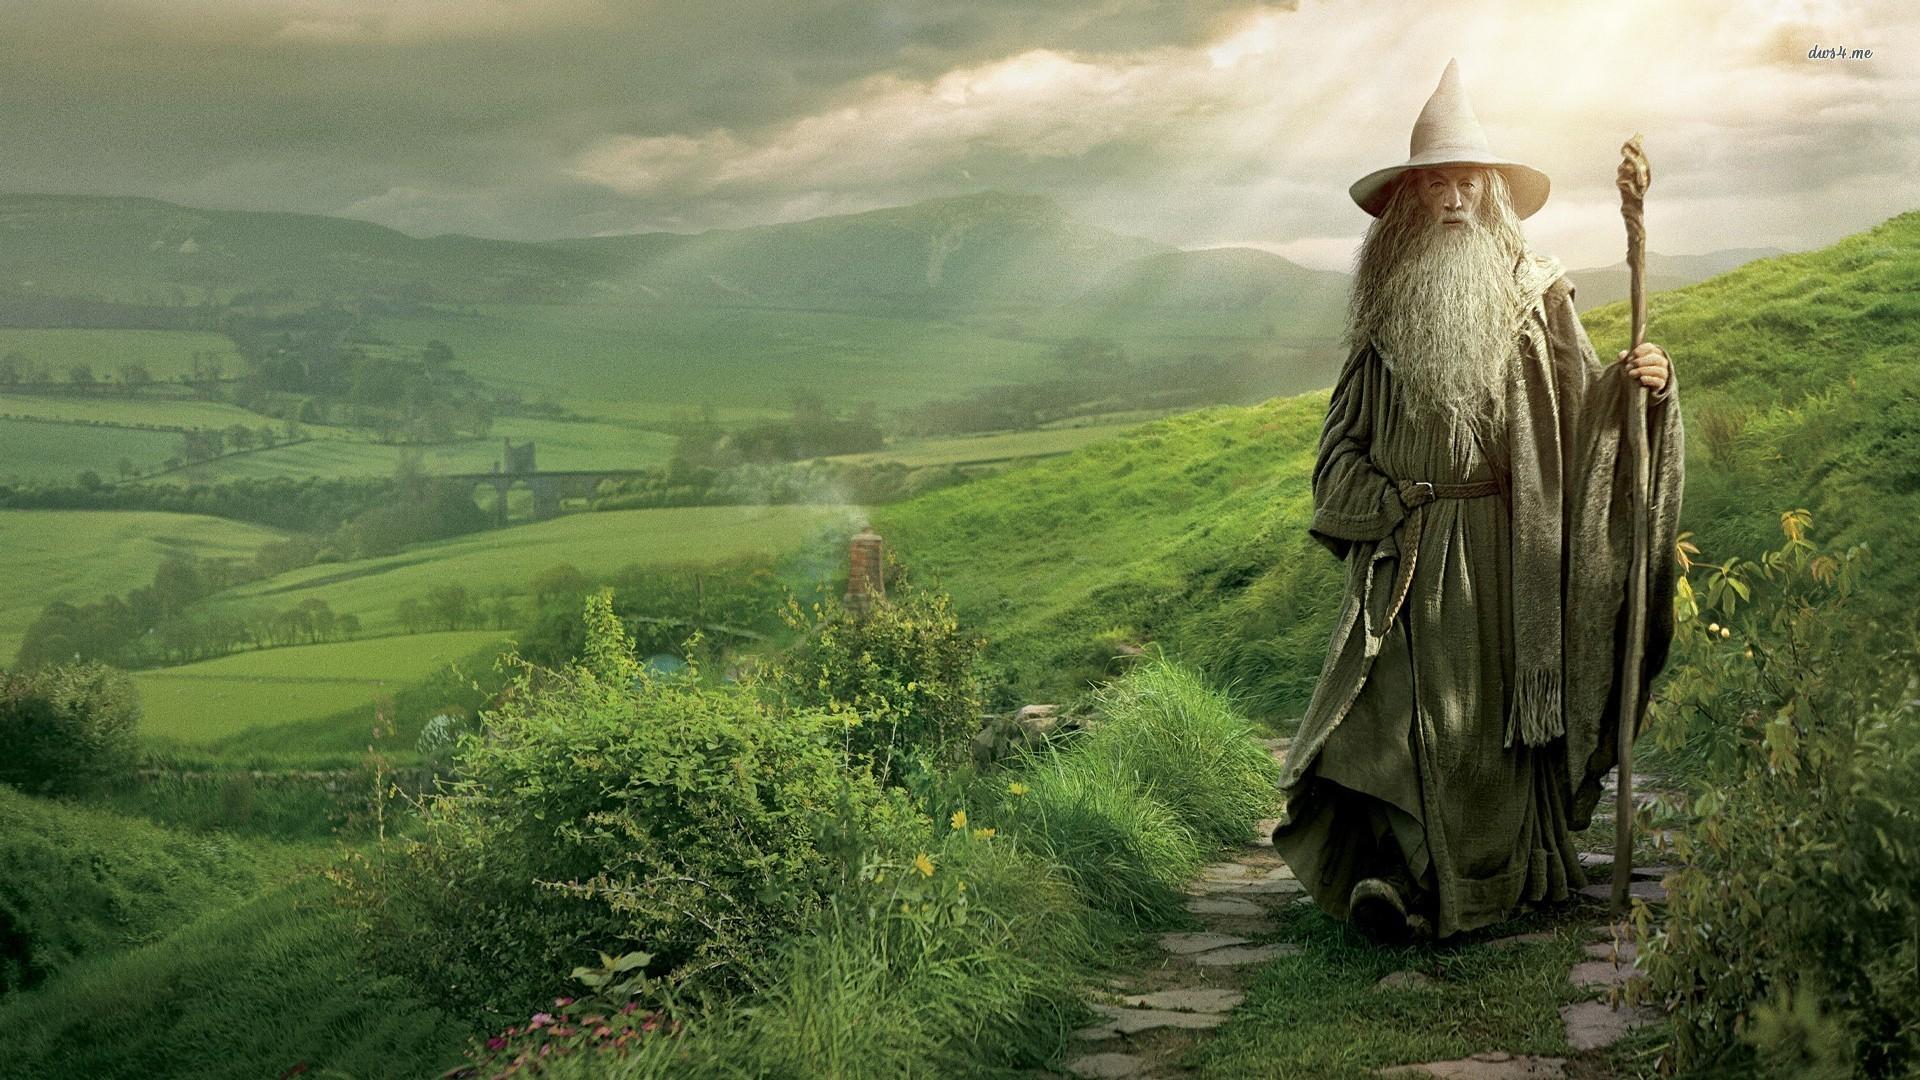 Gandalf Wallpaper Name: 14454-gandalf-the-lord-